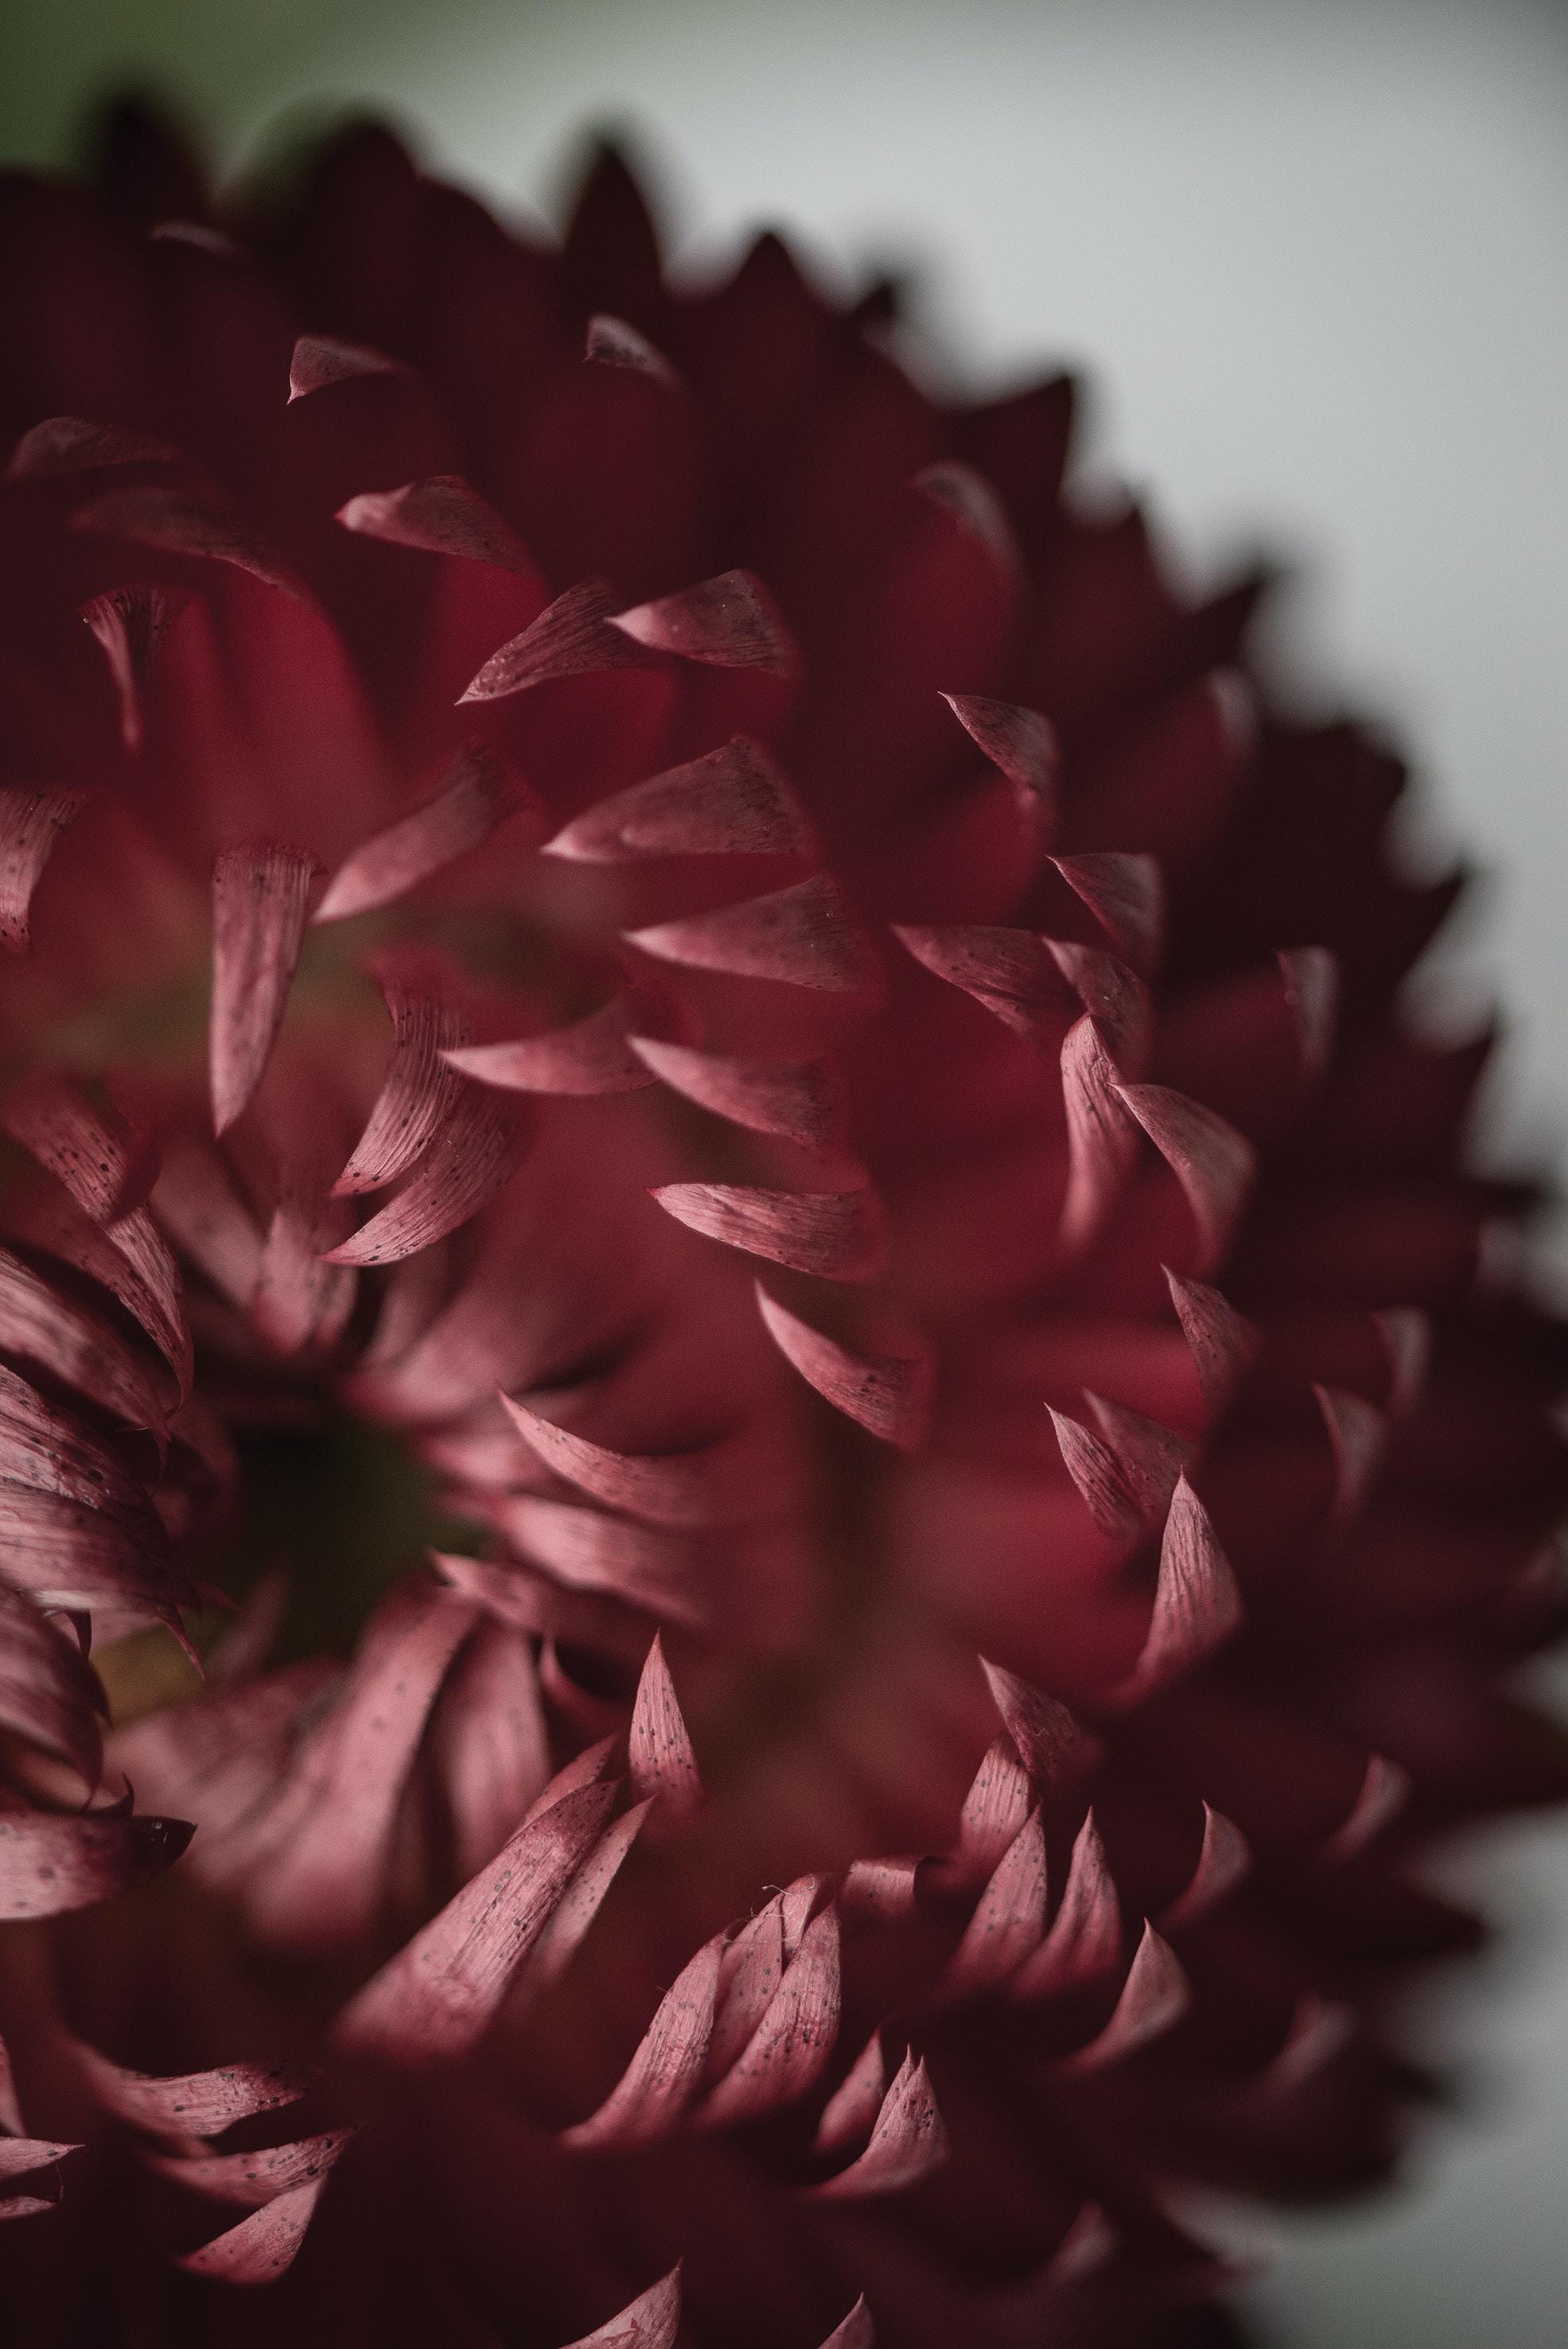 tilt shift lens photography of red flower petal